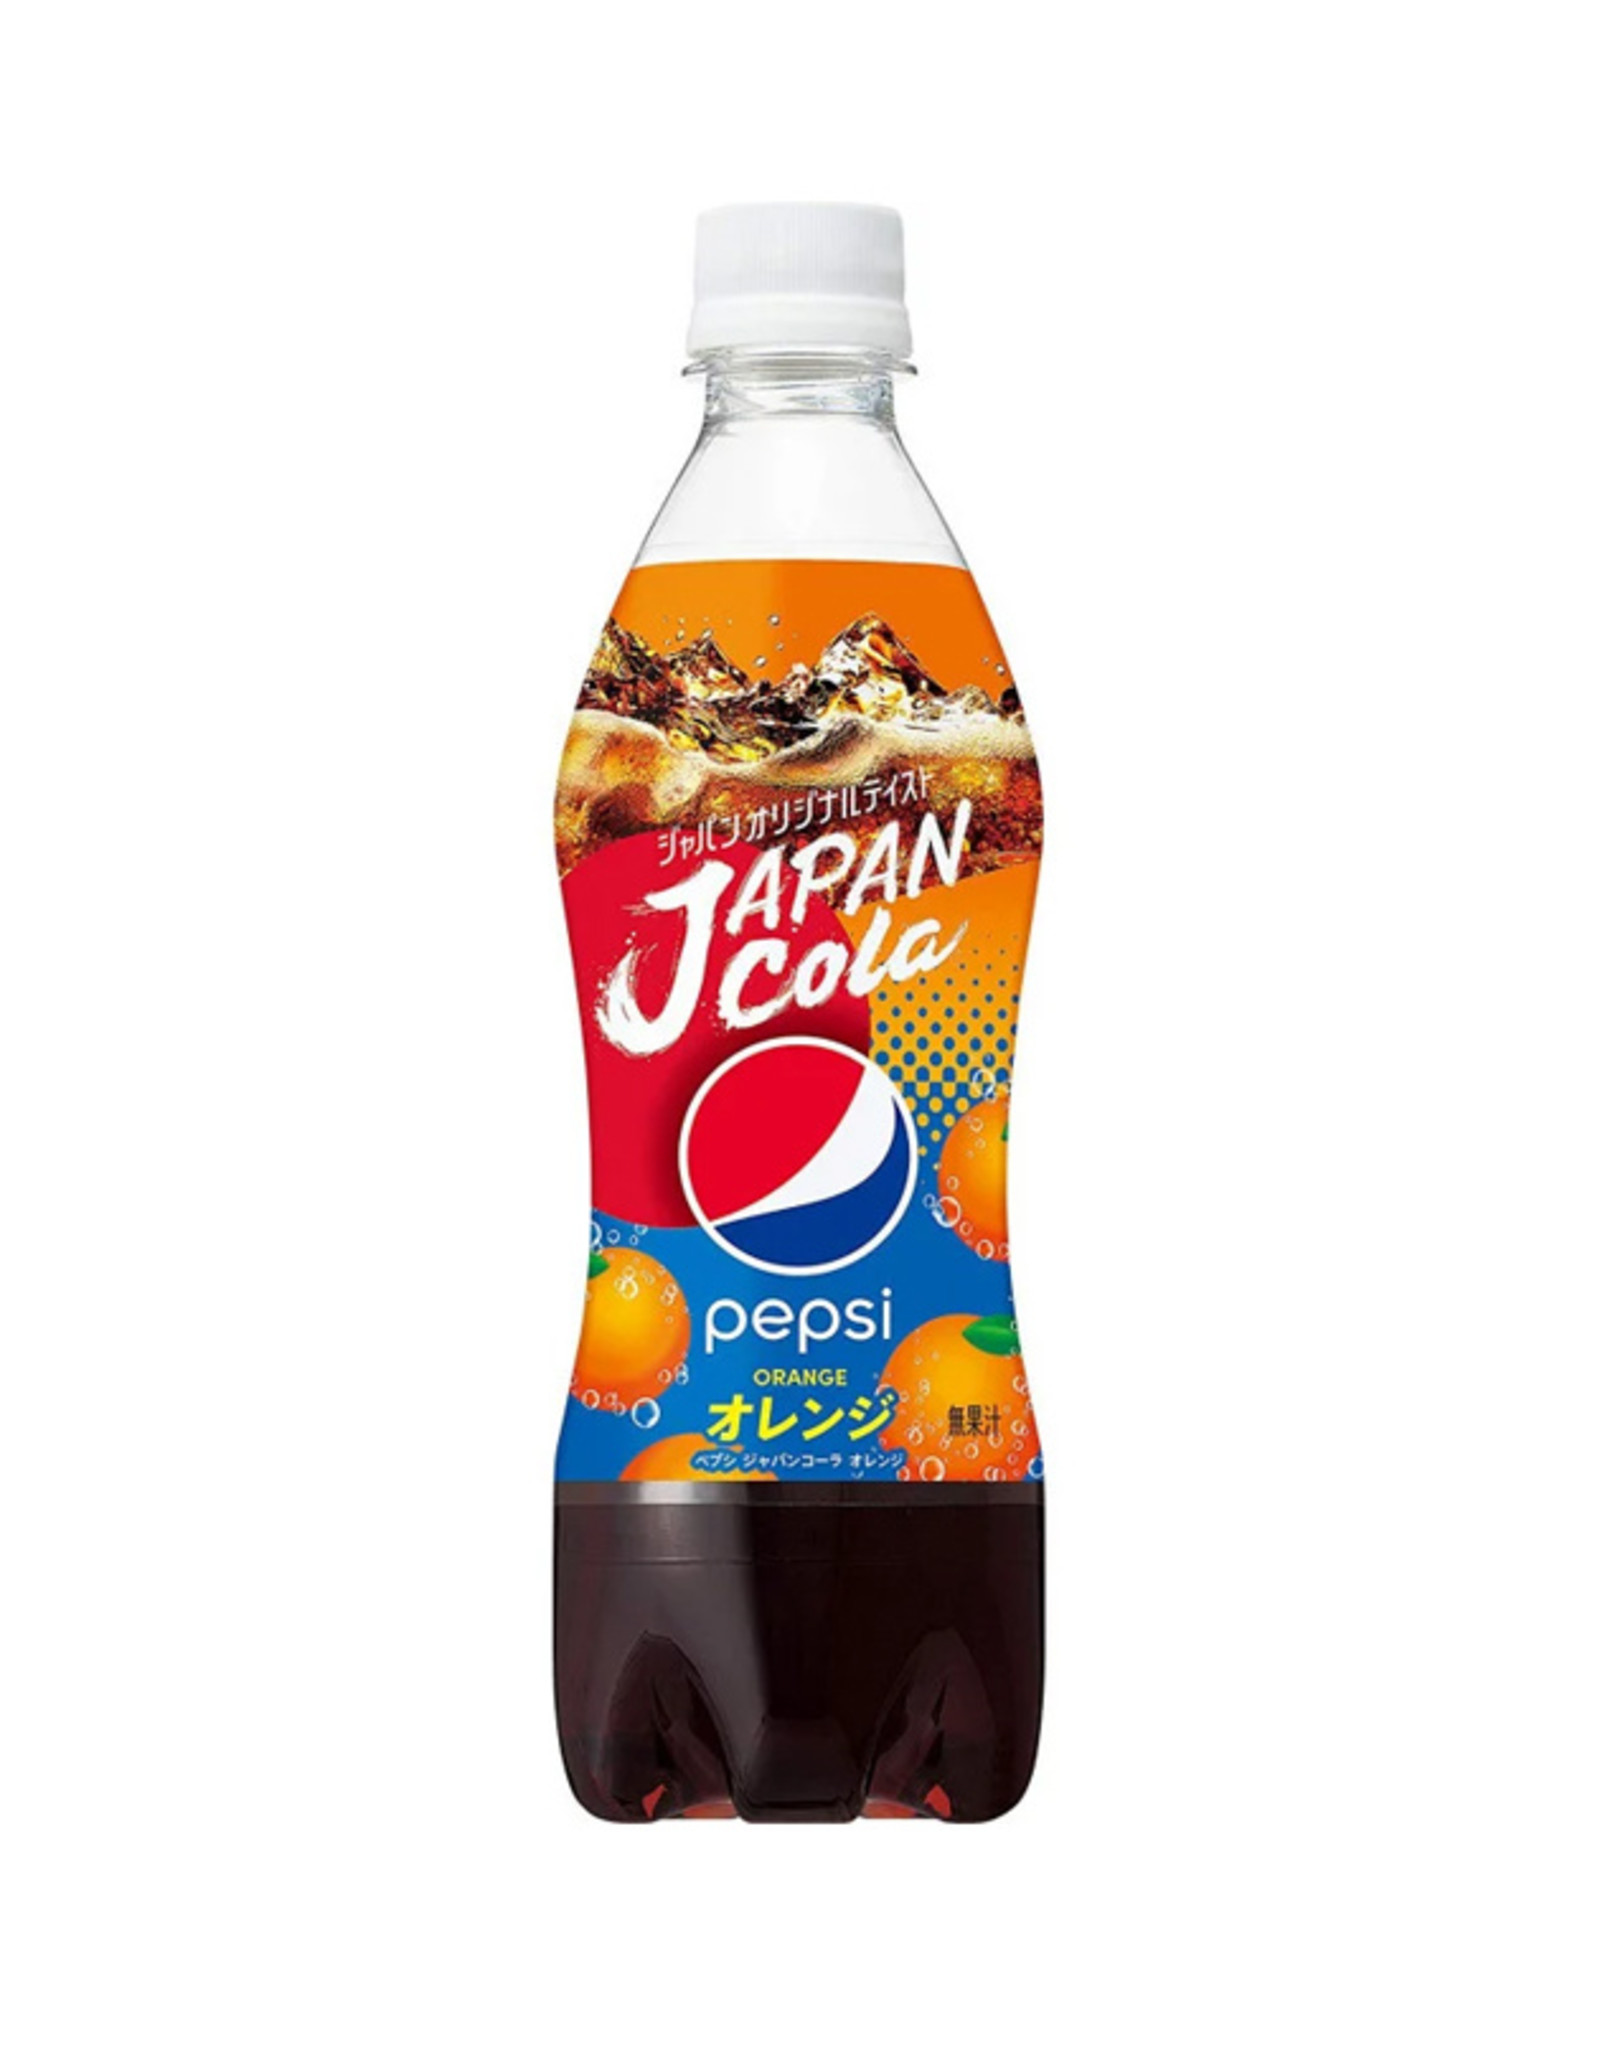 Pepsi Japan Cola - Orange - 500ml